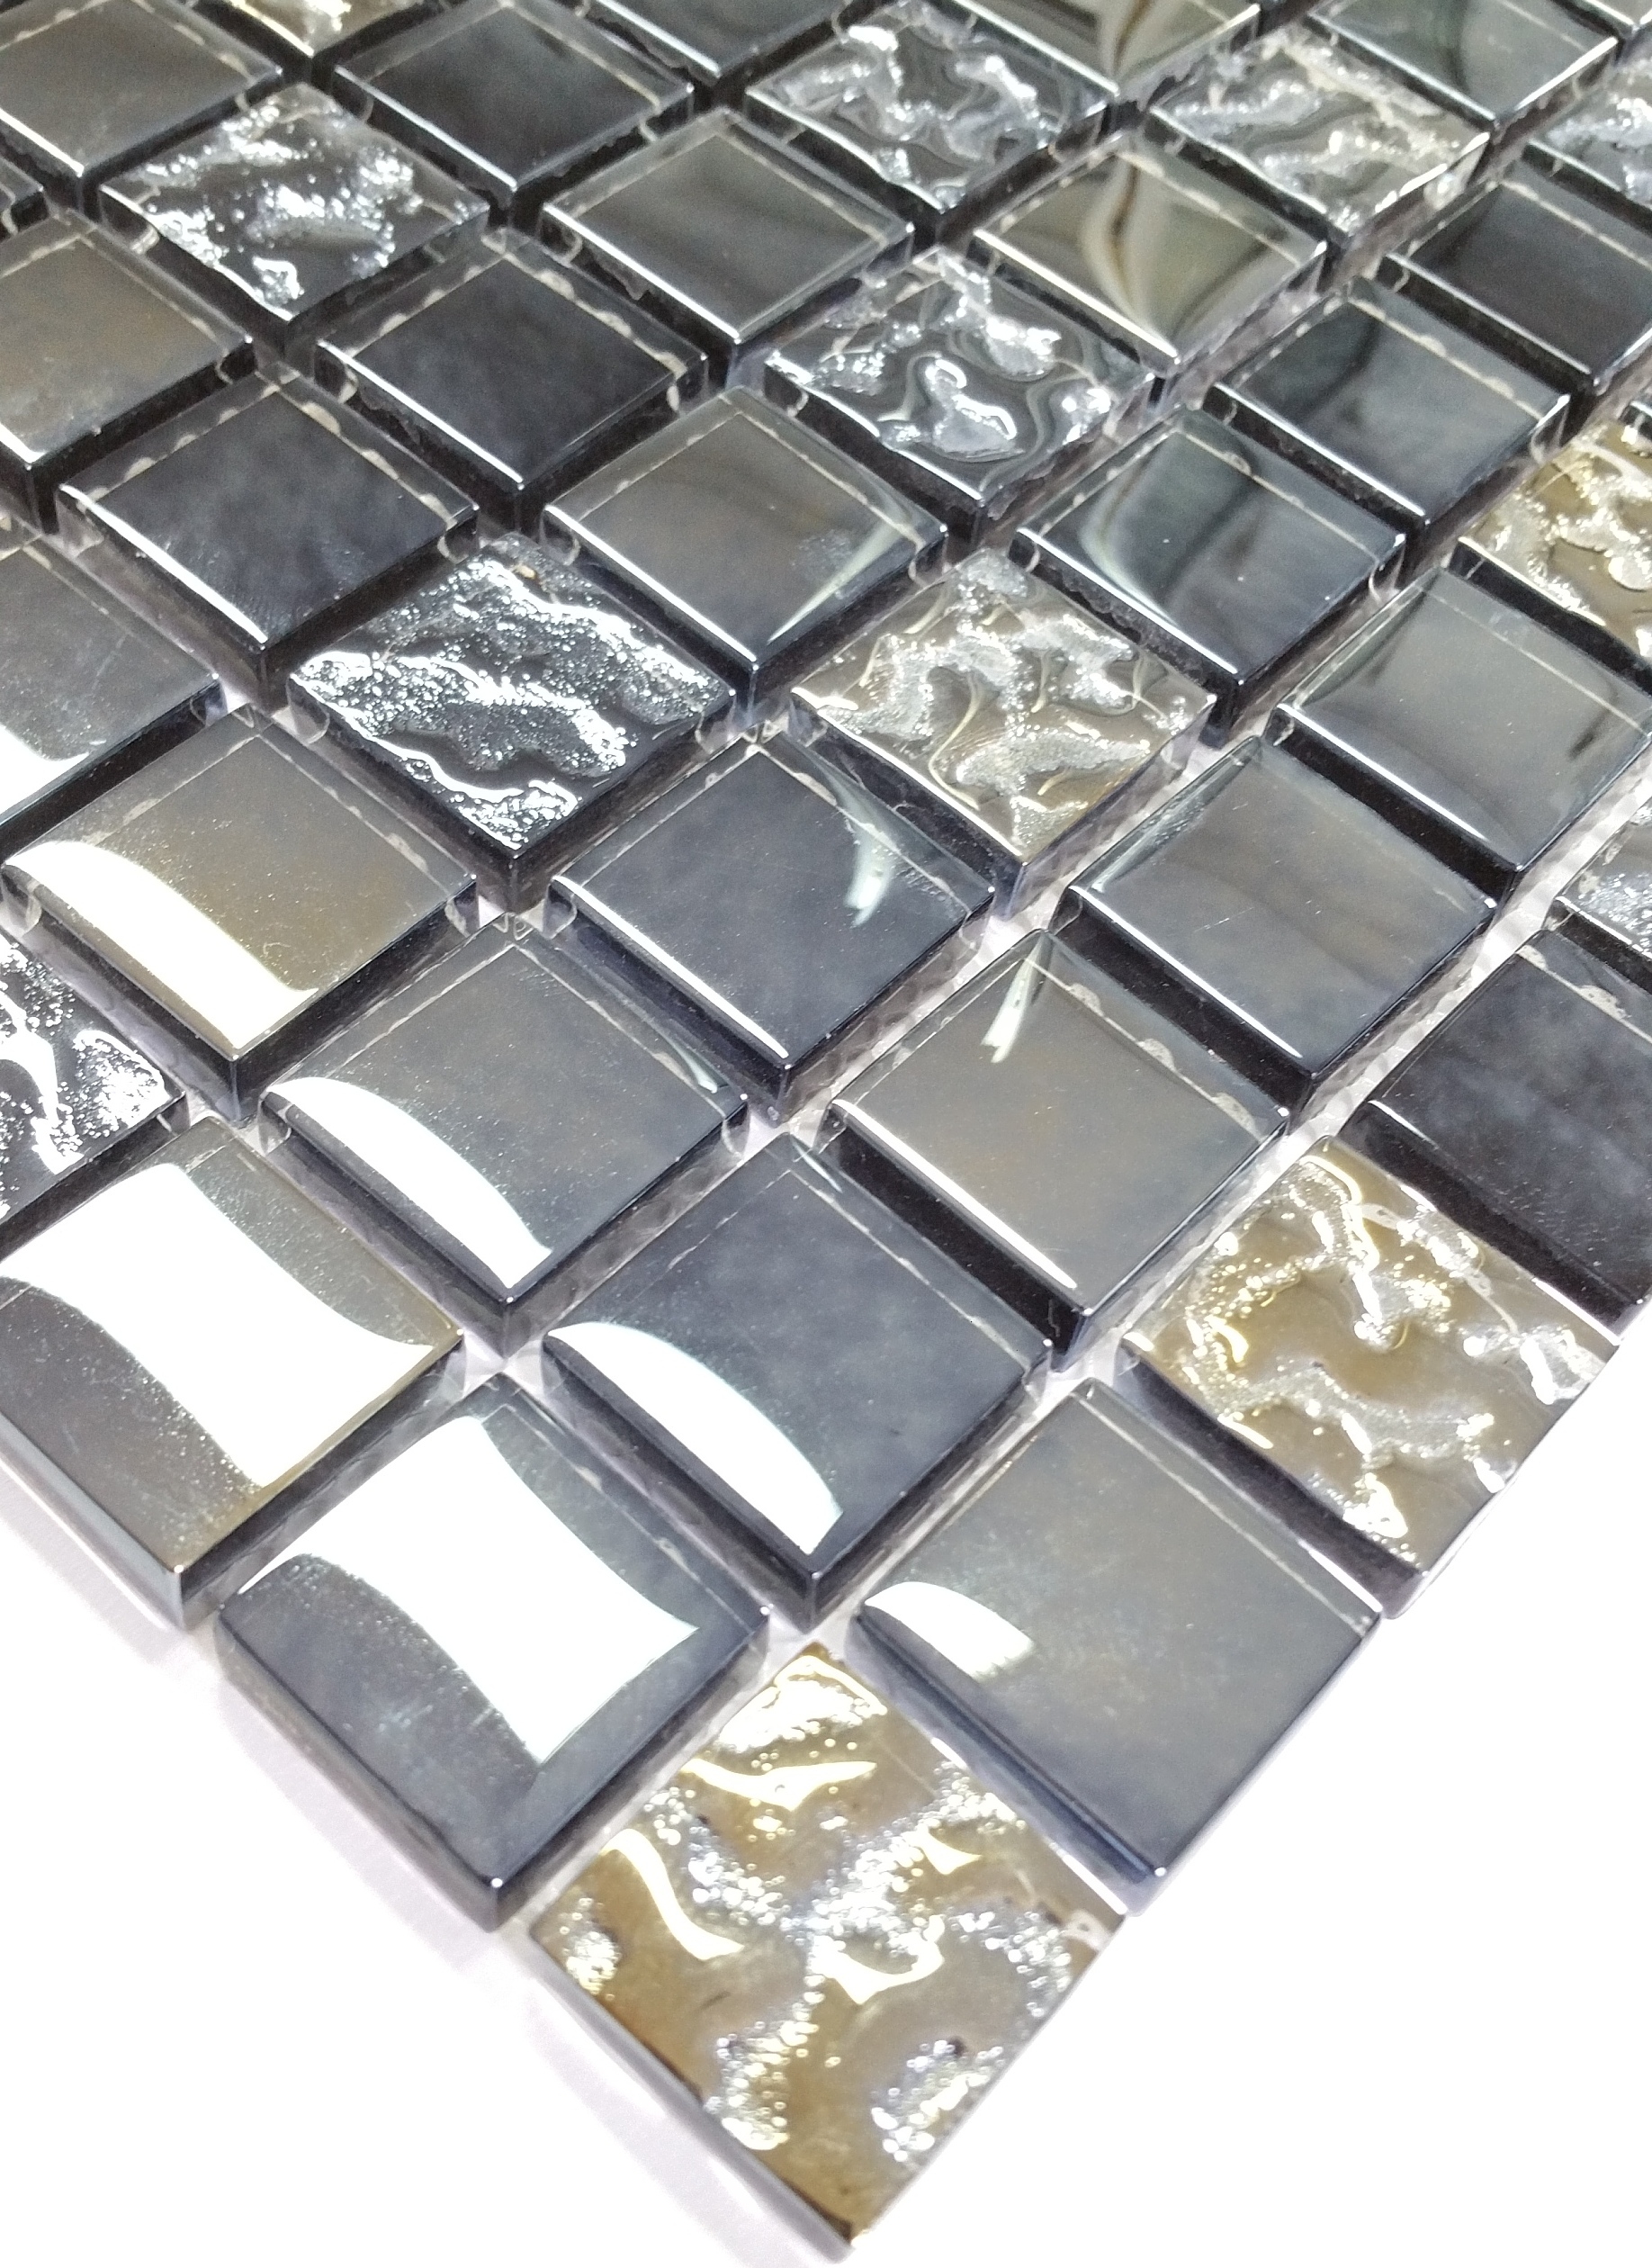 Dusche Fliesen Erst Boden Oder Wand : cm Glas Mosaik DARK NIGHT grau silber Fliesen Boden Wand Dusche Bad